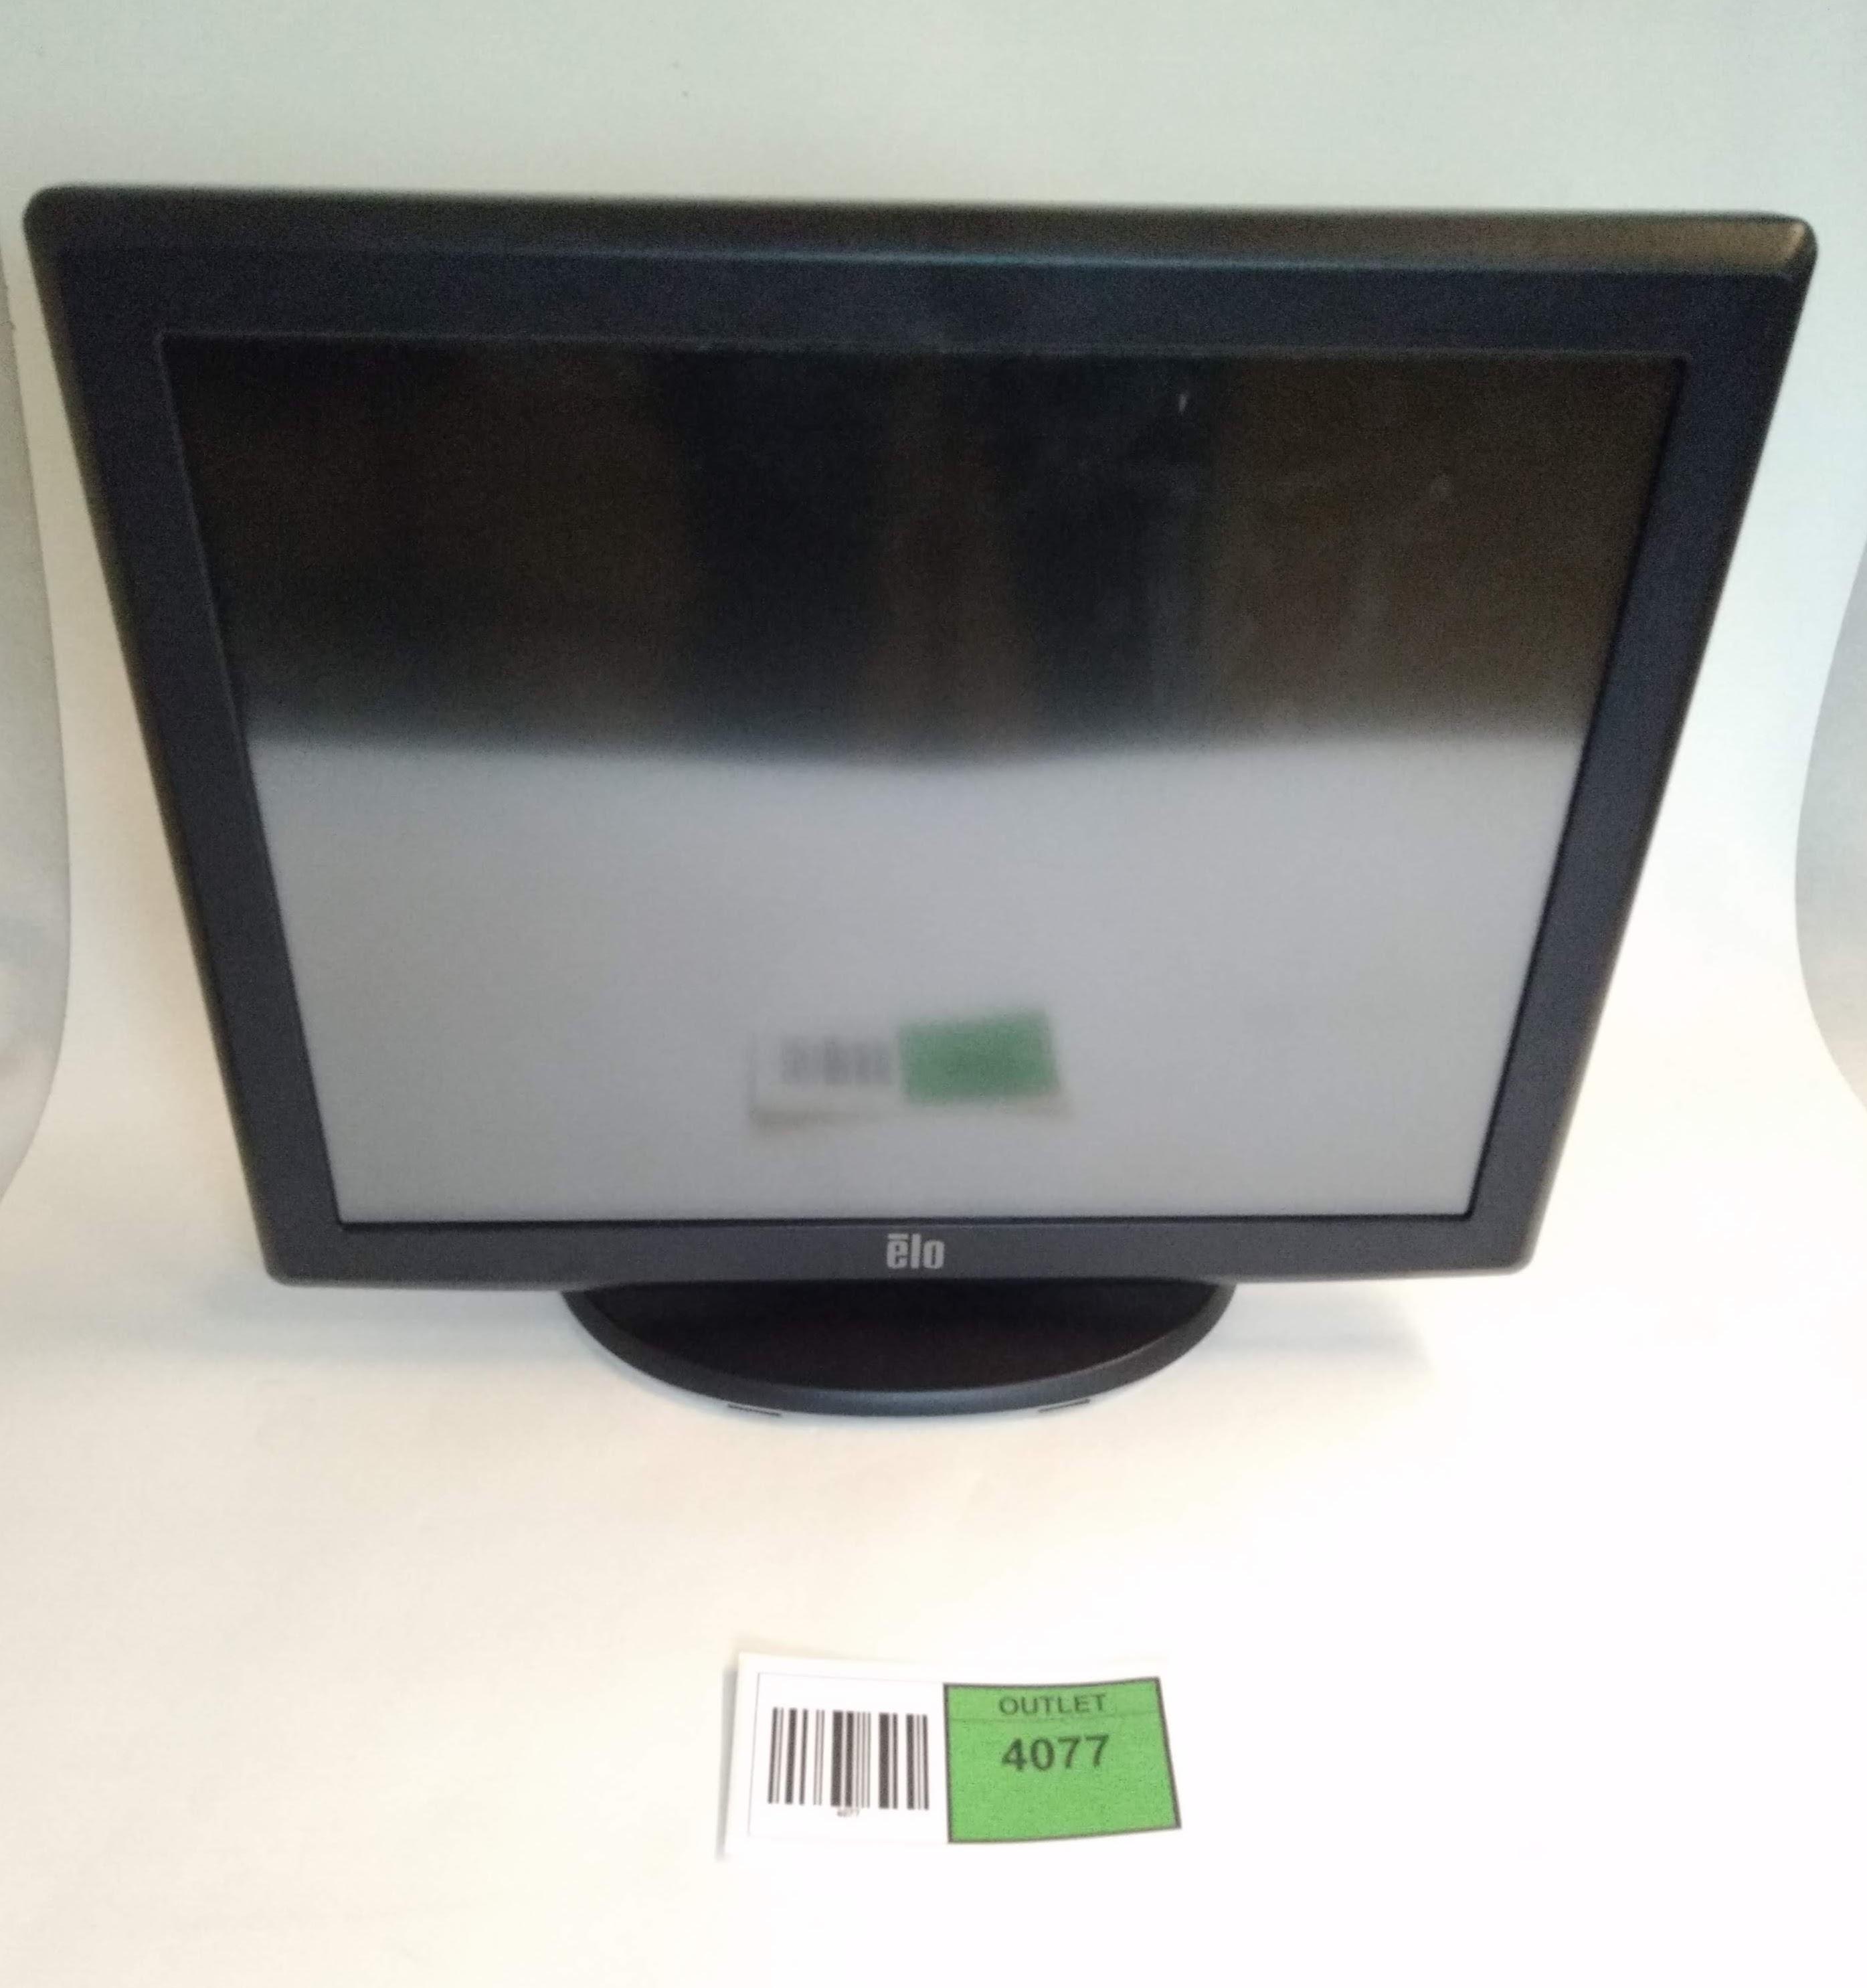 Elo TouchSystems 1515L E210772 Image 1